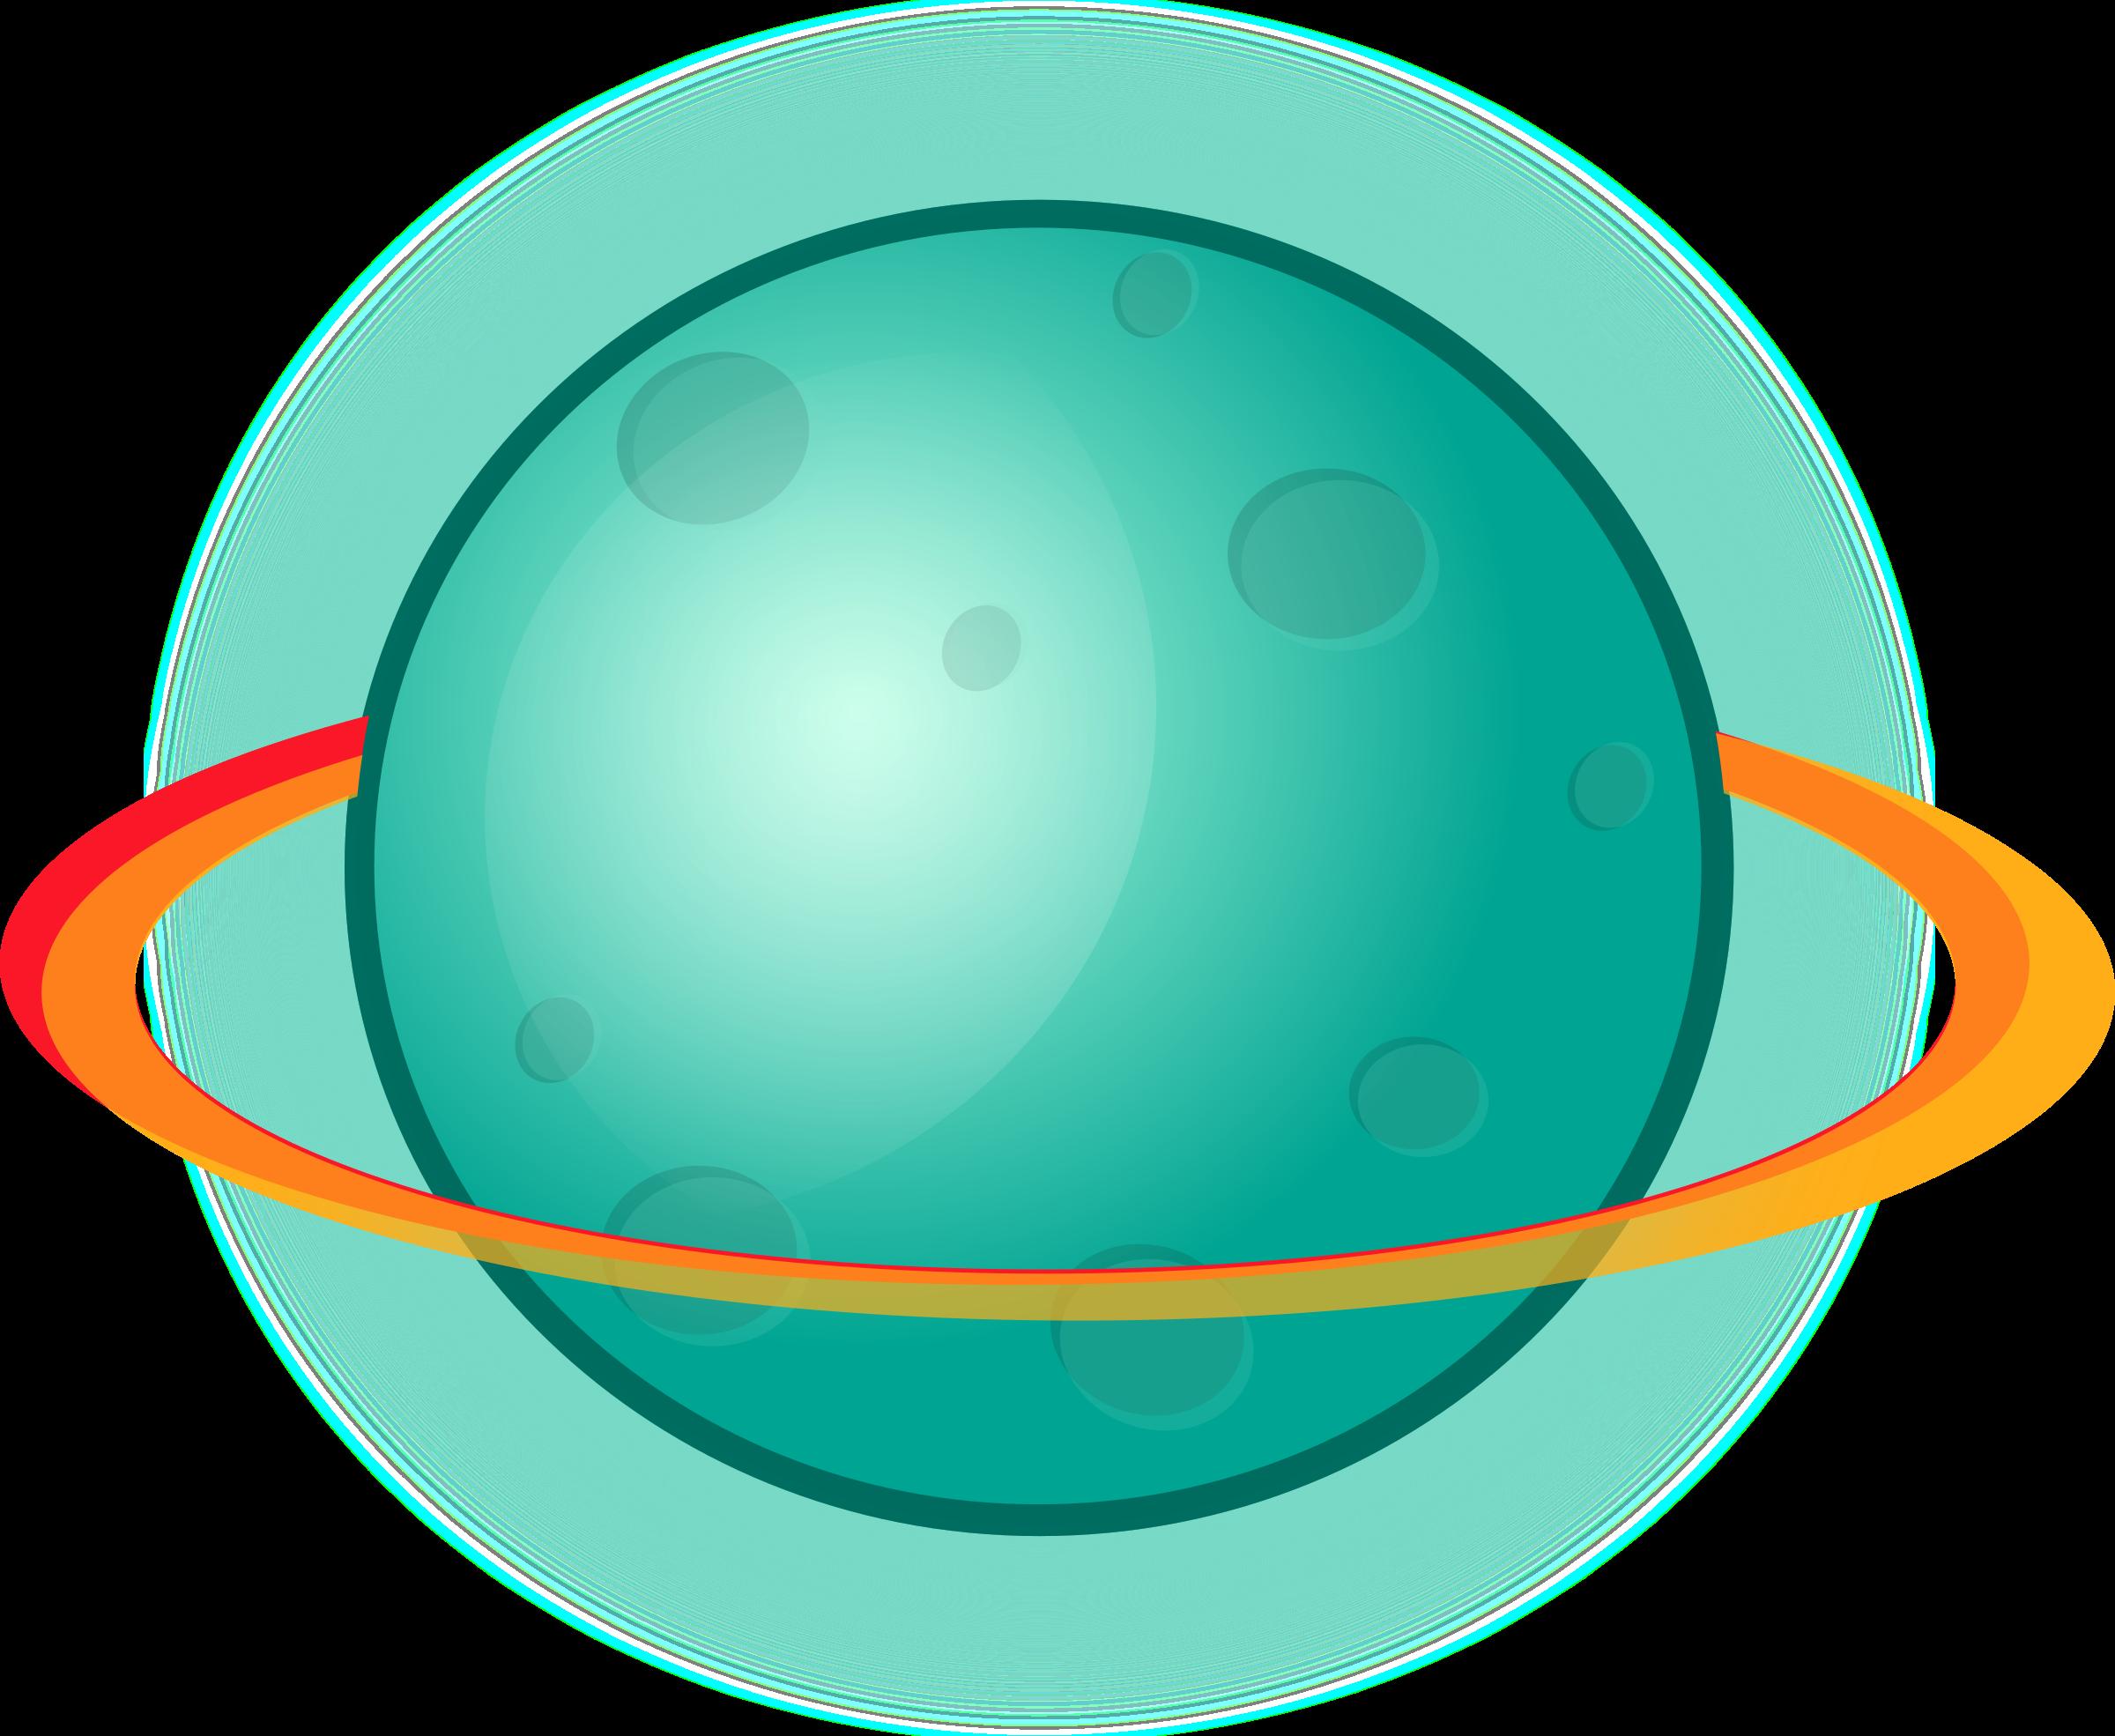 Planeten clipart uranus. Saturn planet free download